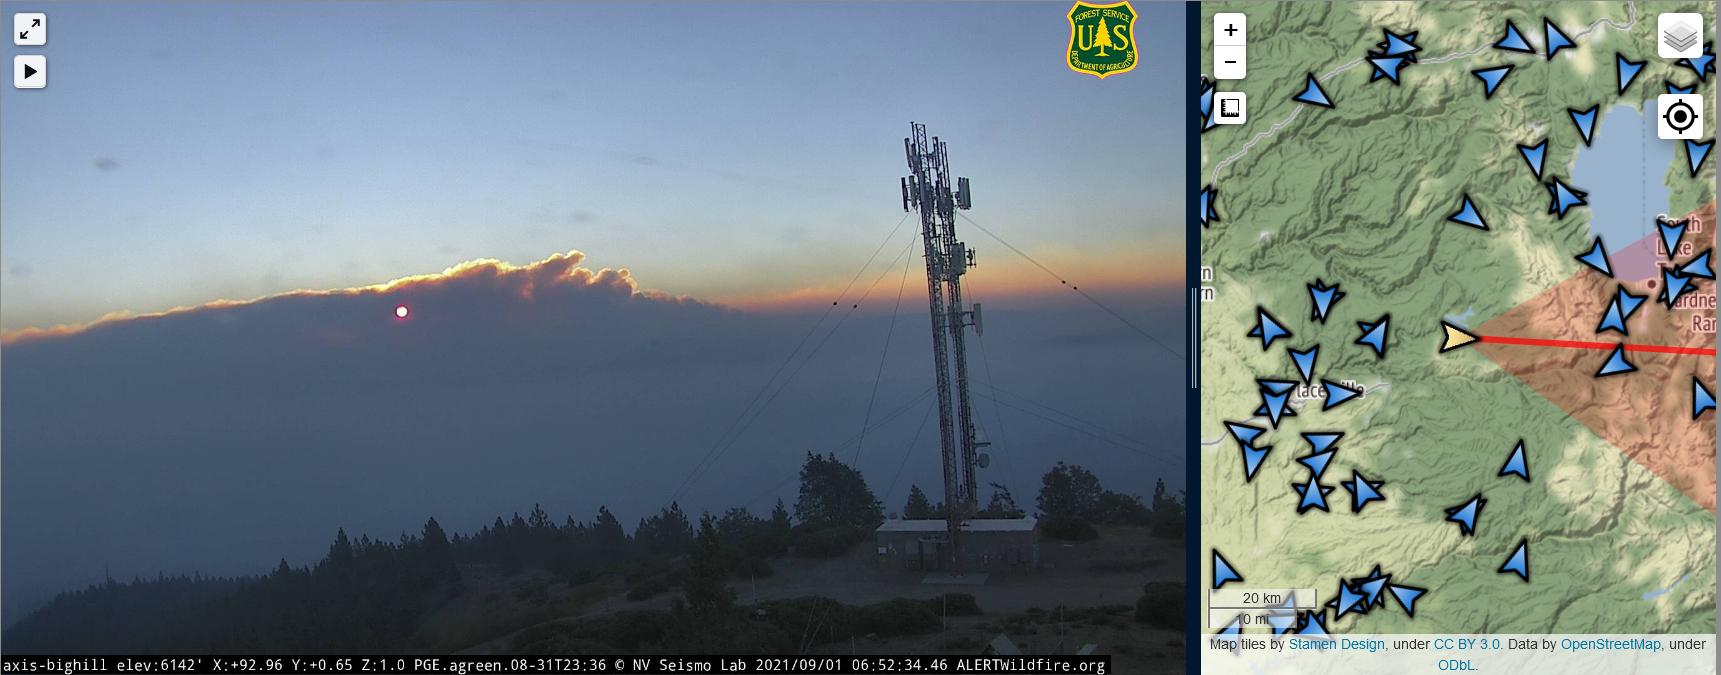 Screenshot 2021-09-01 at 06-52-44 ALERTWildfire Sierra-Foothills.png